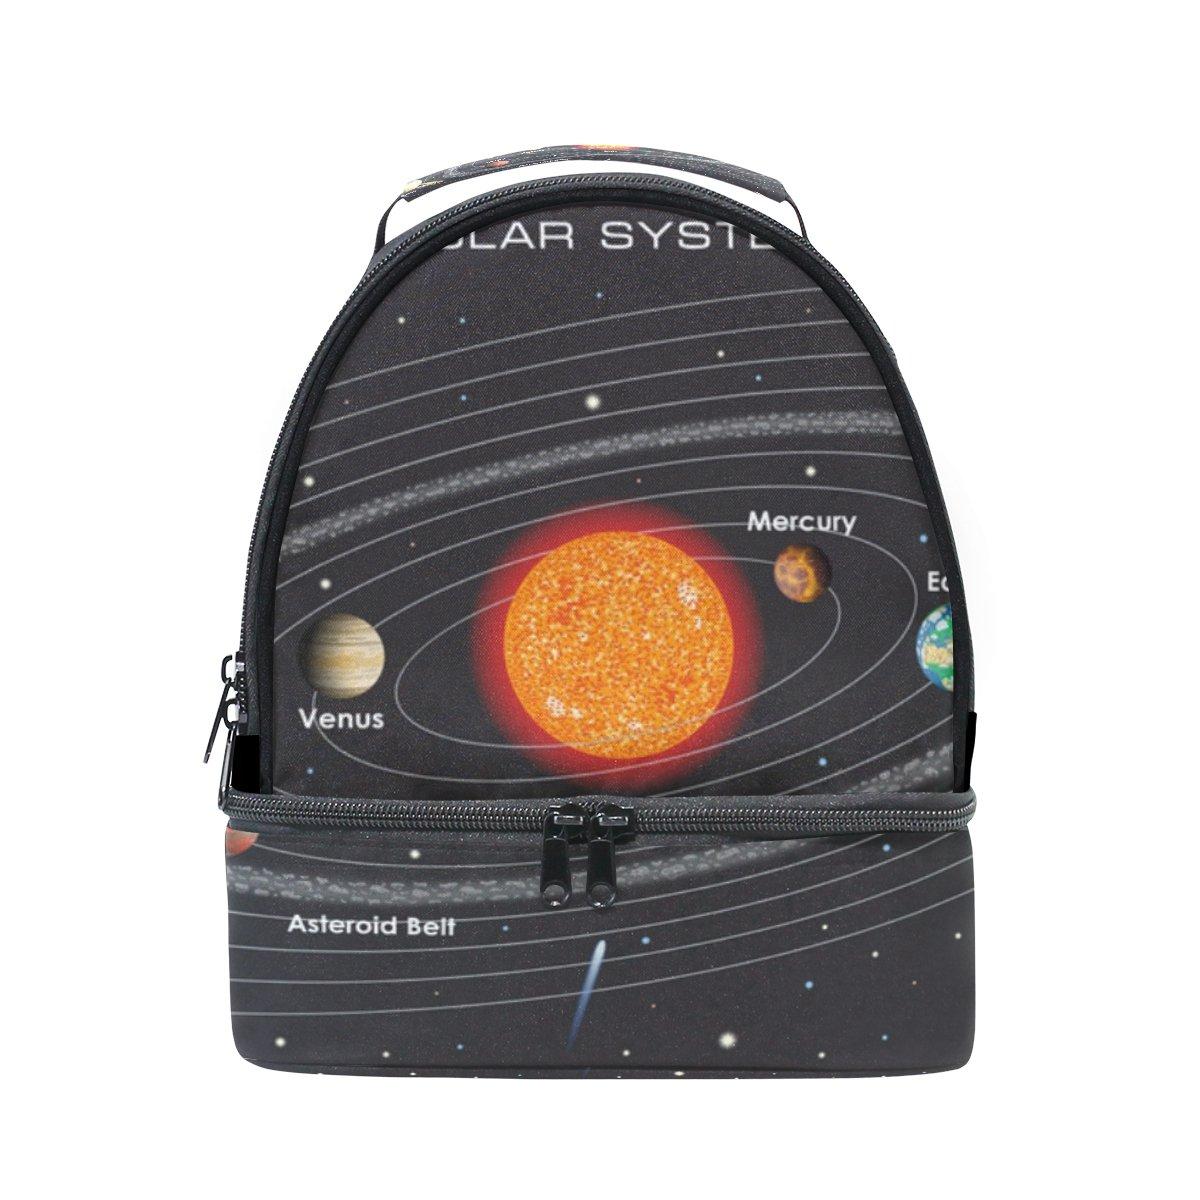 Cooper girl Fantasy Solar System Lunch Bag Cooler Tote Bag Large Capacity for Women Men Adult Kids Boys Girls